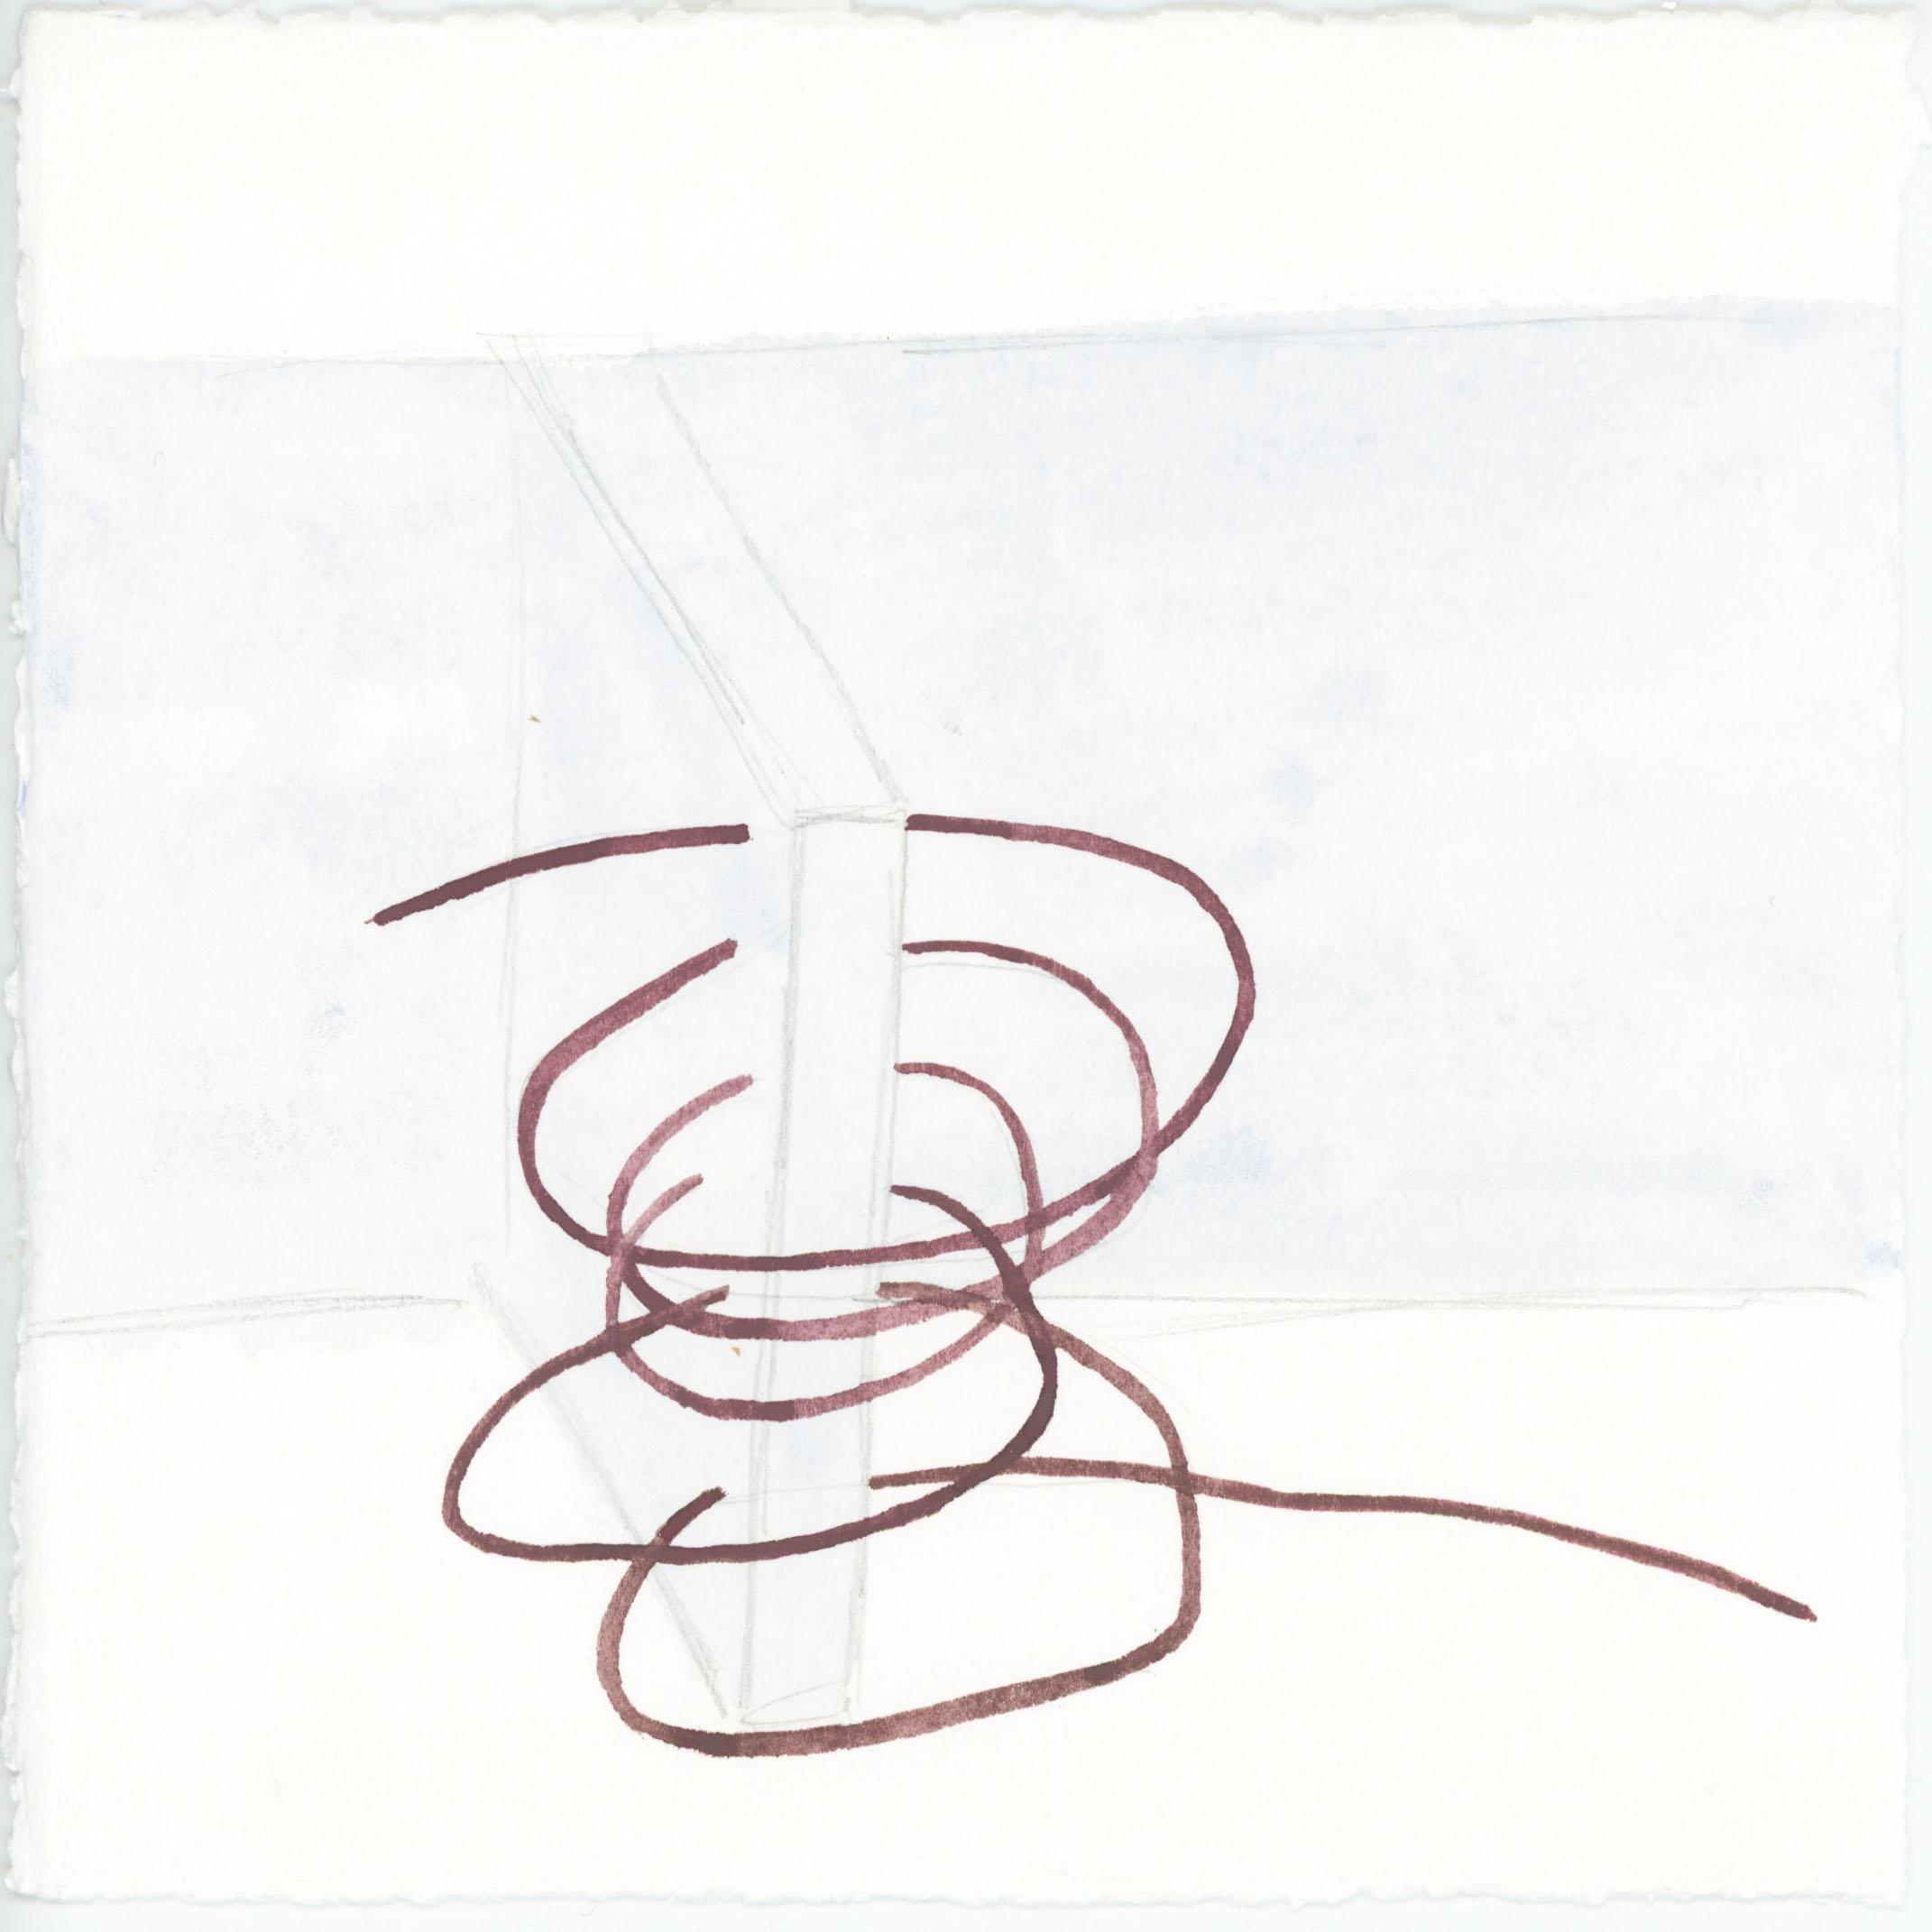 19. Watercolour on paper. 13 x 13CM